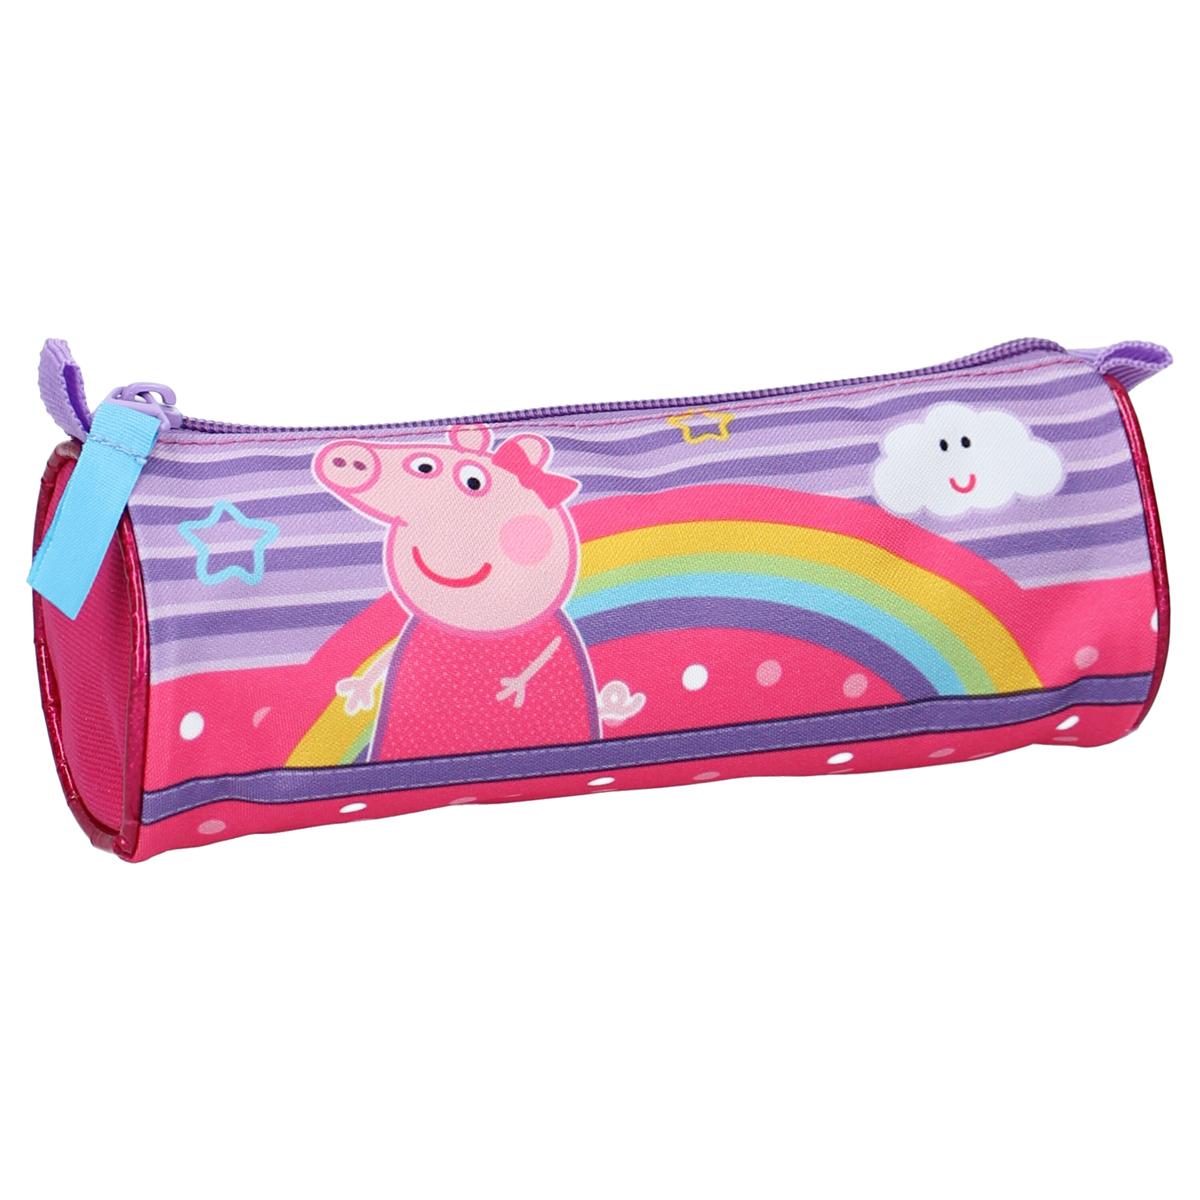 Trousse tube \'Peppa Pig\' violet rose - 20x7 cm - [A0584]